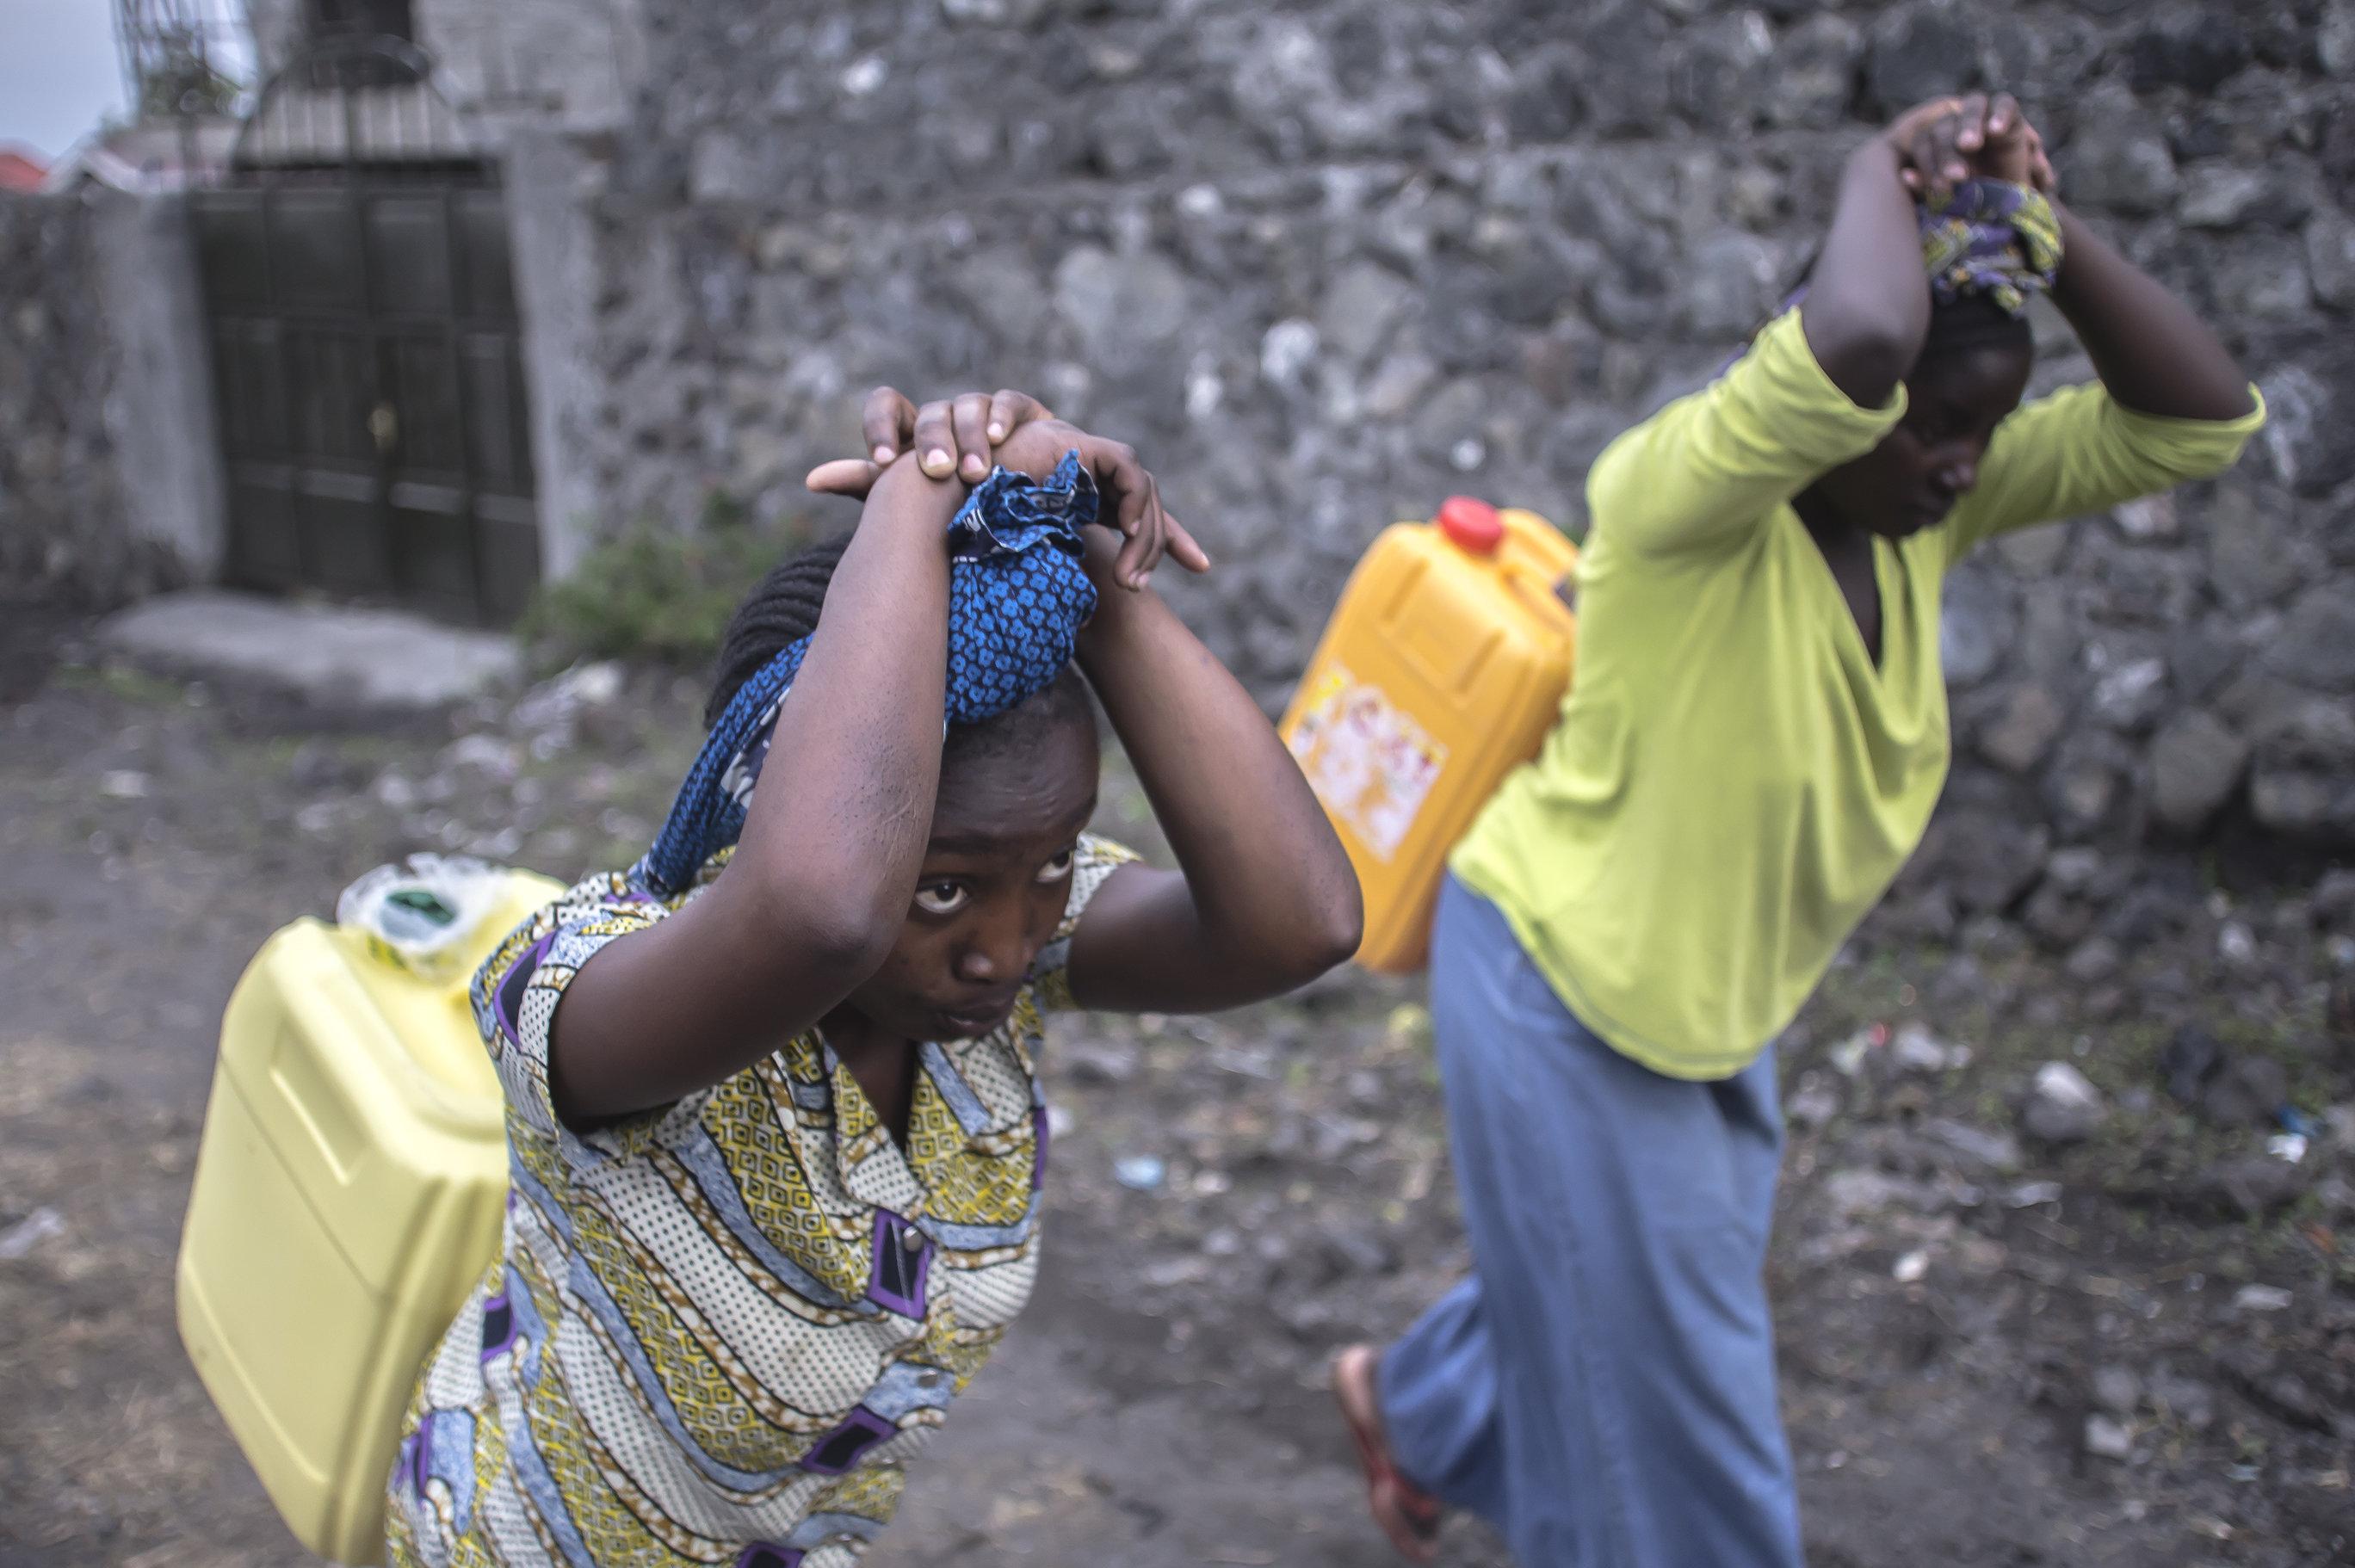 Hogar de niñas violadas, víctimas del líder rebelde Ntabo Ntaberi congoleño, conocido como Sheka